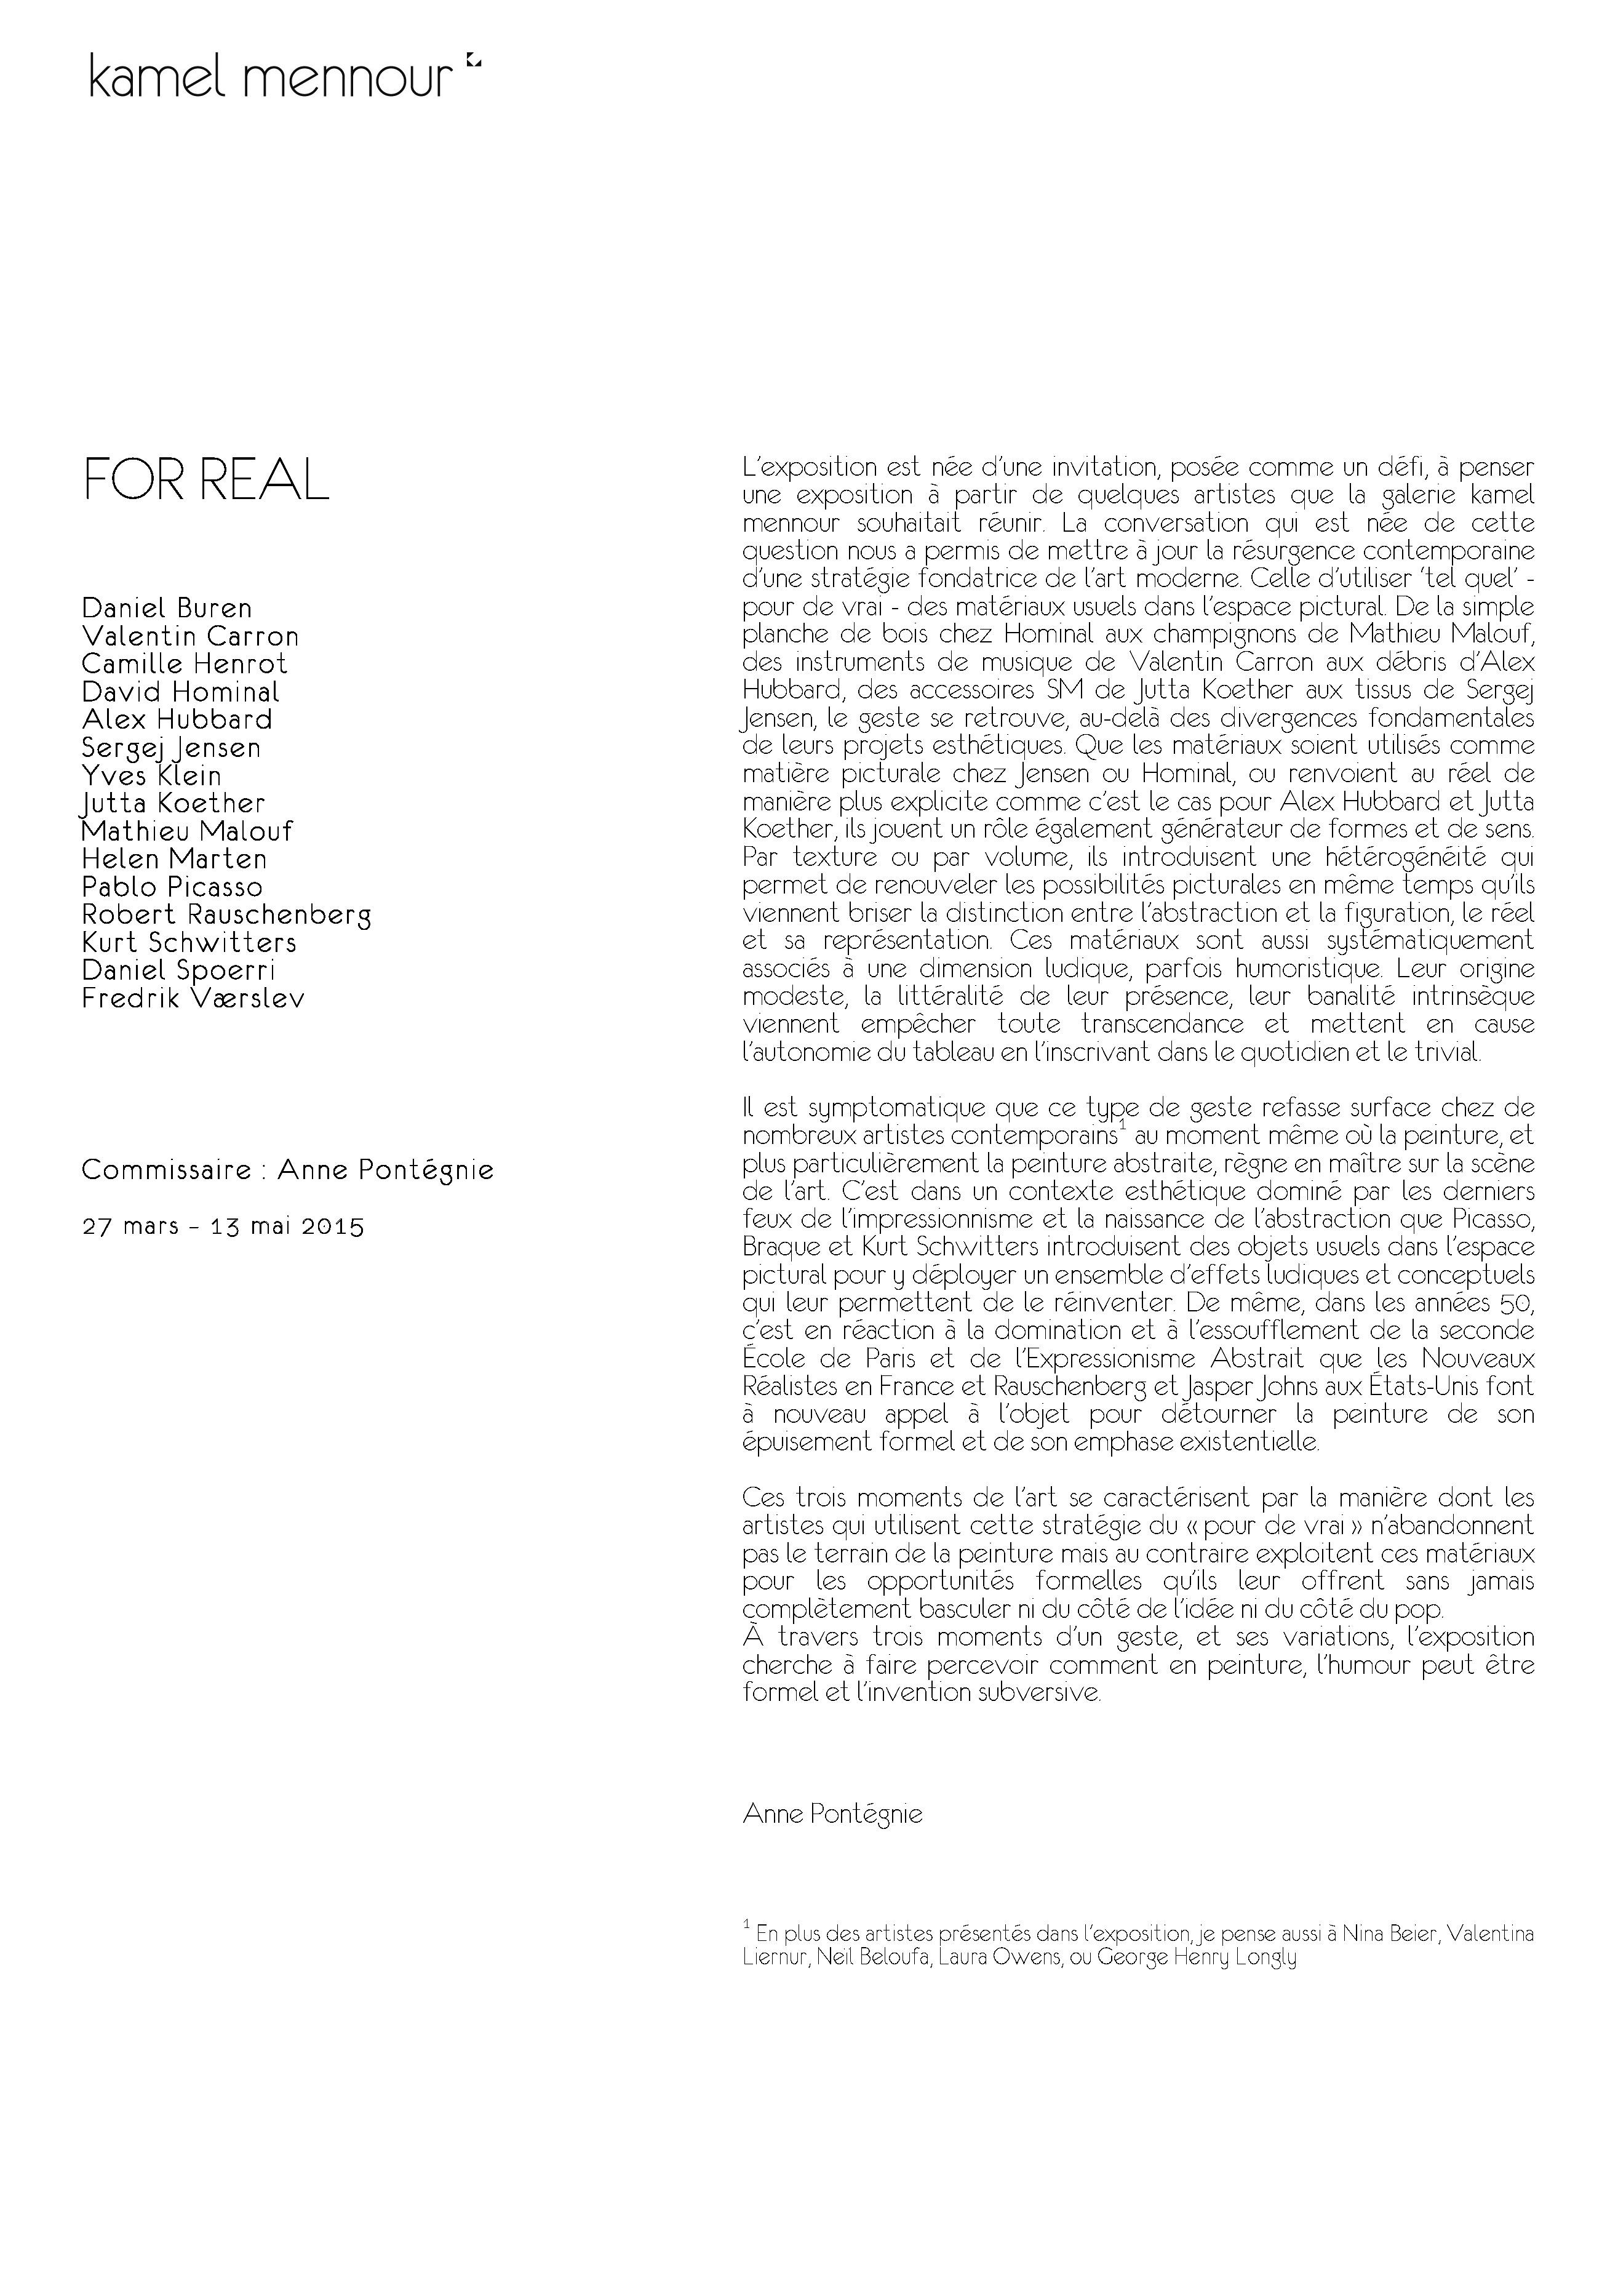 "Anne Pontégnie, ""For Real"", Essay for the exhibition 'For Real', Kamel Mennour, Paris, 2015."